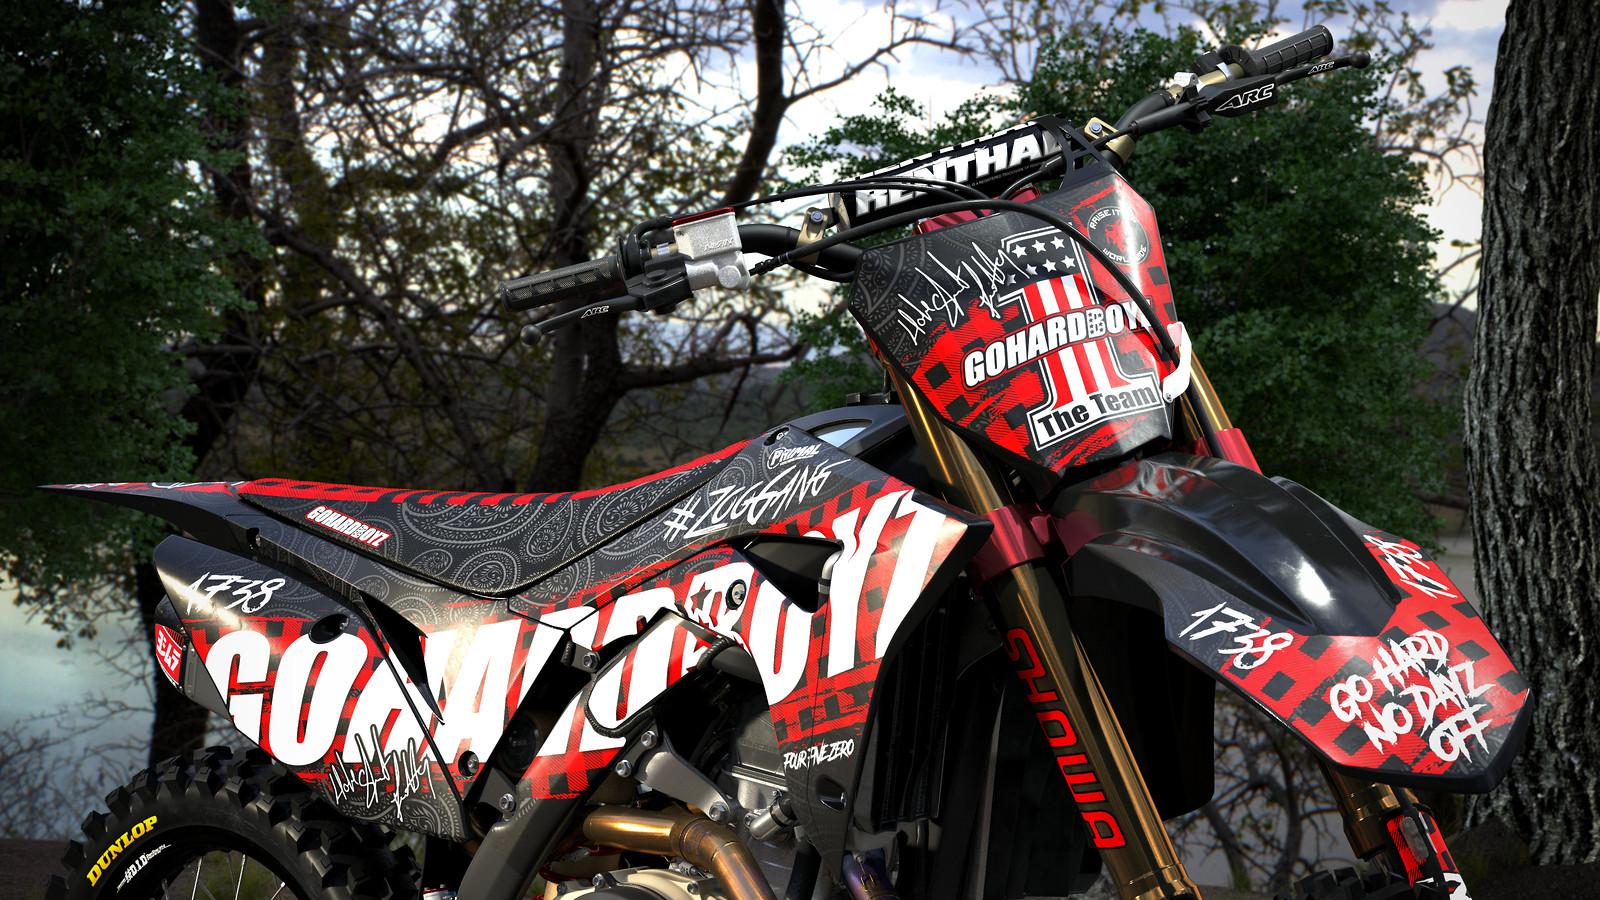 Primal X Motorsports - MX - Graphics - Motocross - Fetty Wap - Go Hard Boyz 2 - PRIMAL_X_MOTORSPORTS - Motocross Pictures - Vital MX